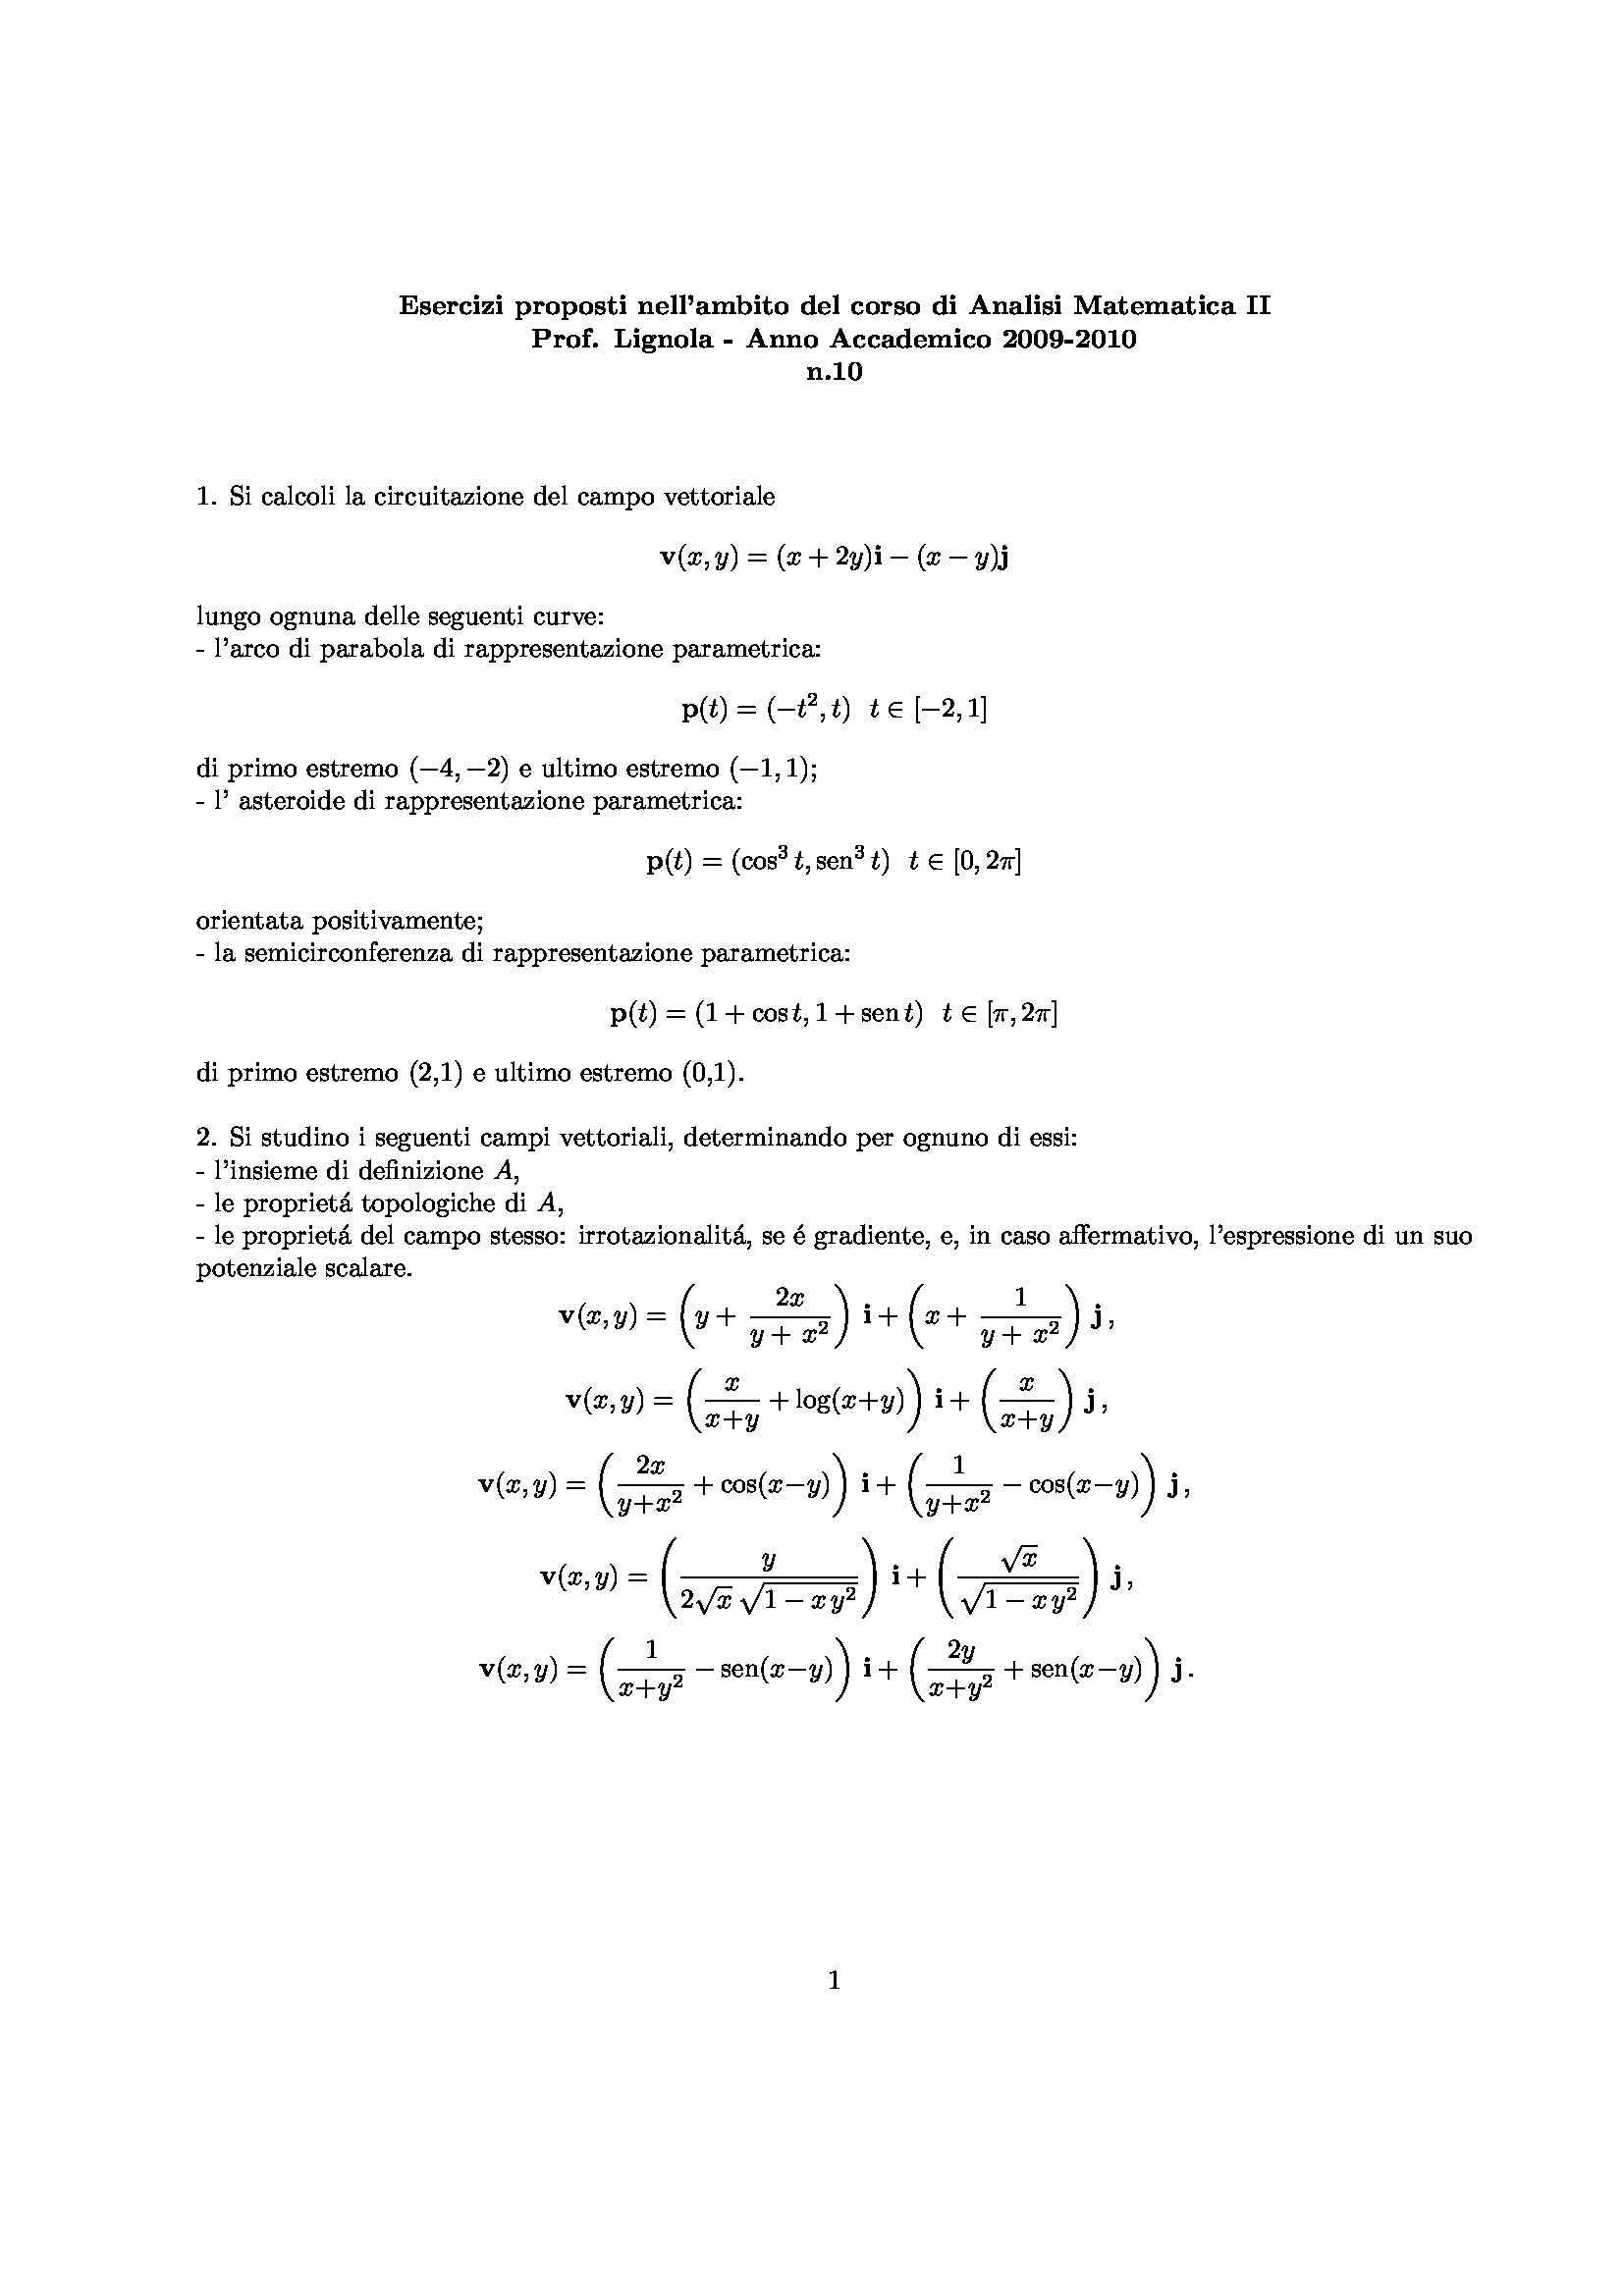 Analisi matematica II - Esercizio 11